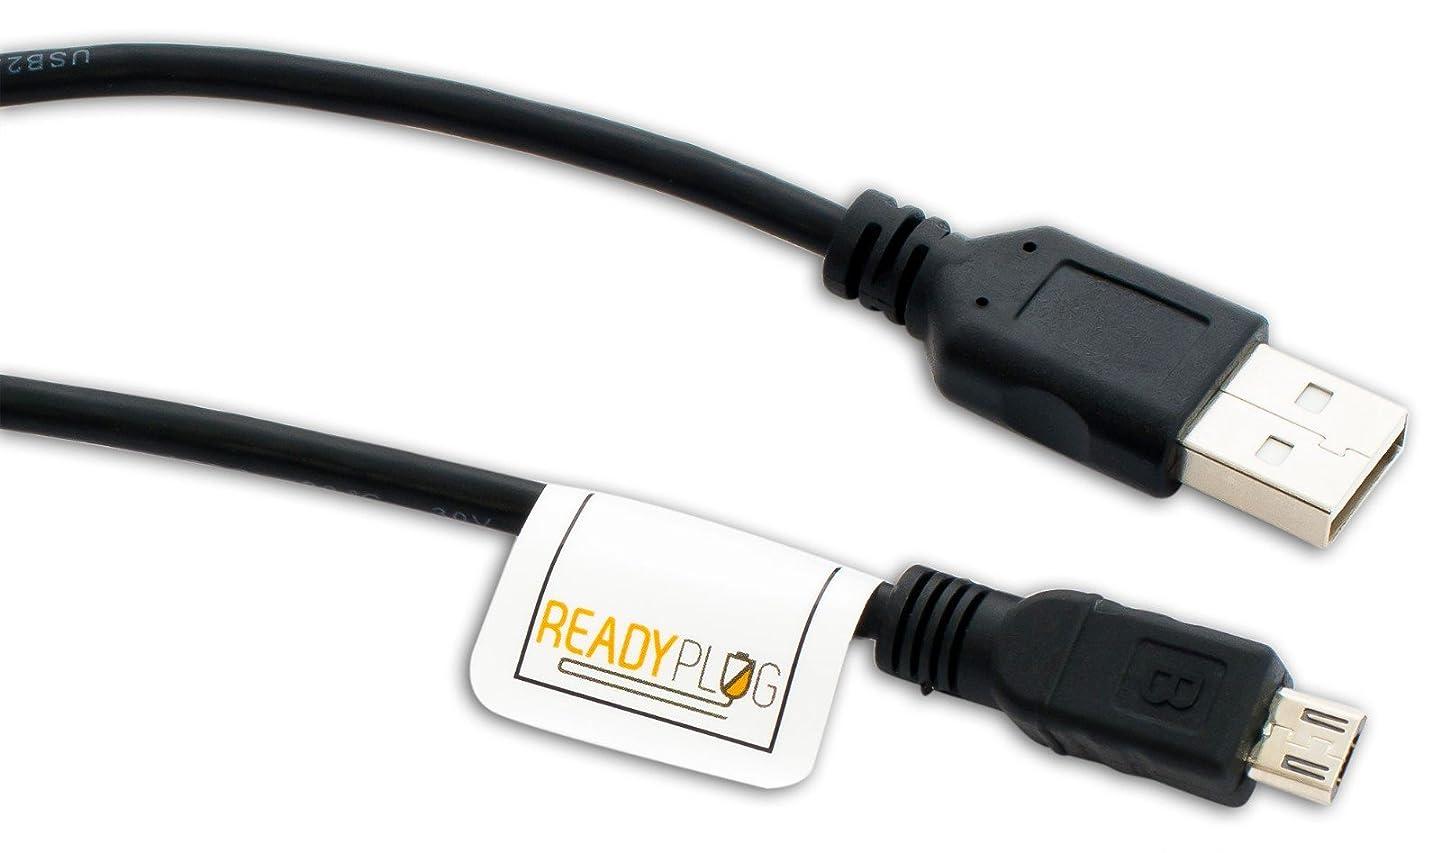 ReadyPlug USB Cable for: Nikon COOLPIX P1000 Camera (Black, 6 Feet)